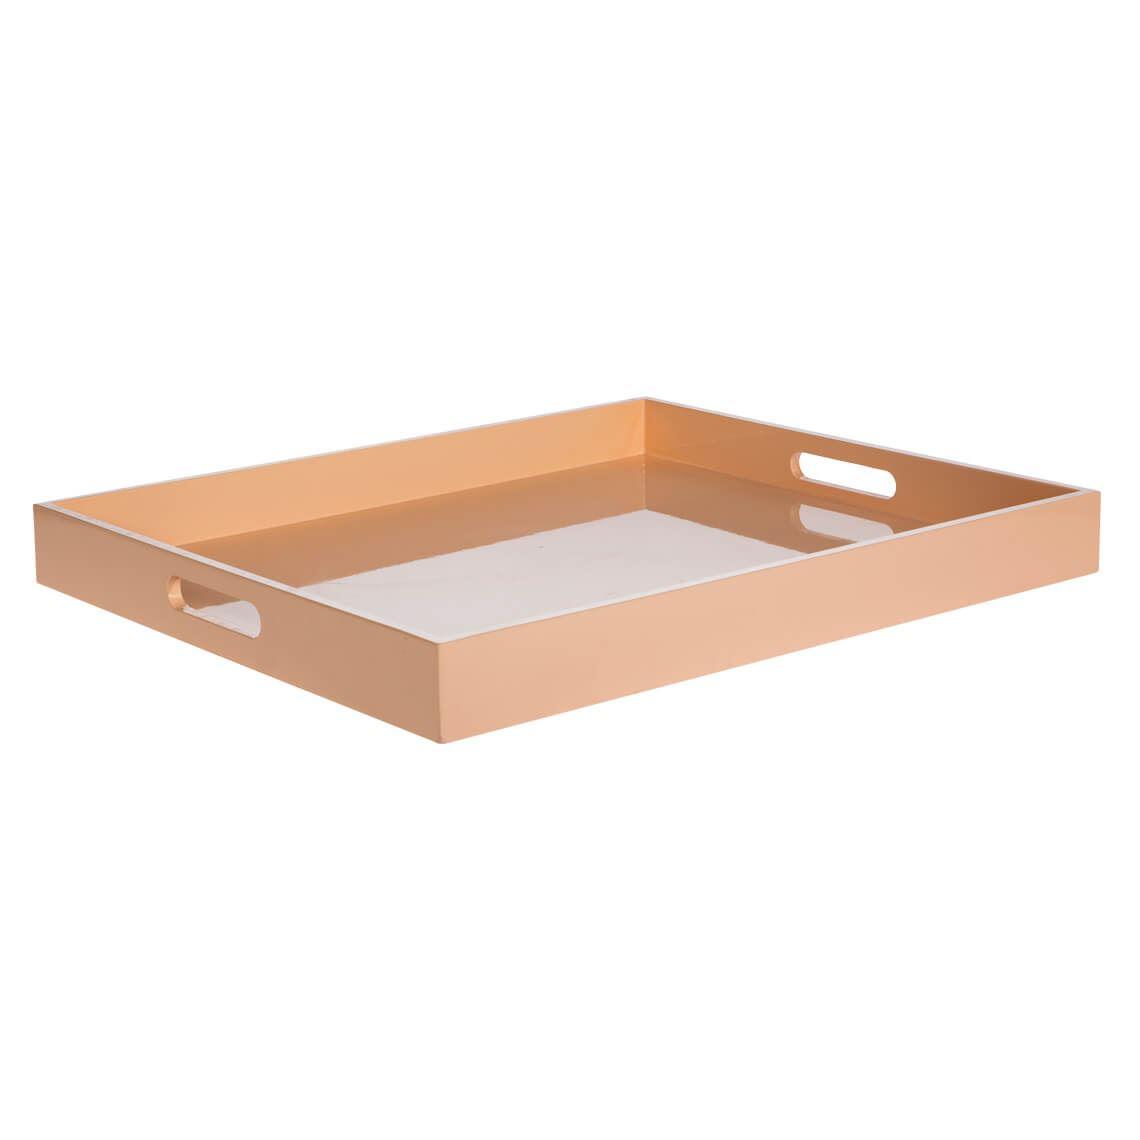 Lacquer Tray Size W 56cm x D 46cm x H 6cm in Peach 95% Mdf/5% Glue Freedom